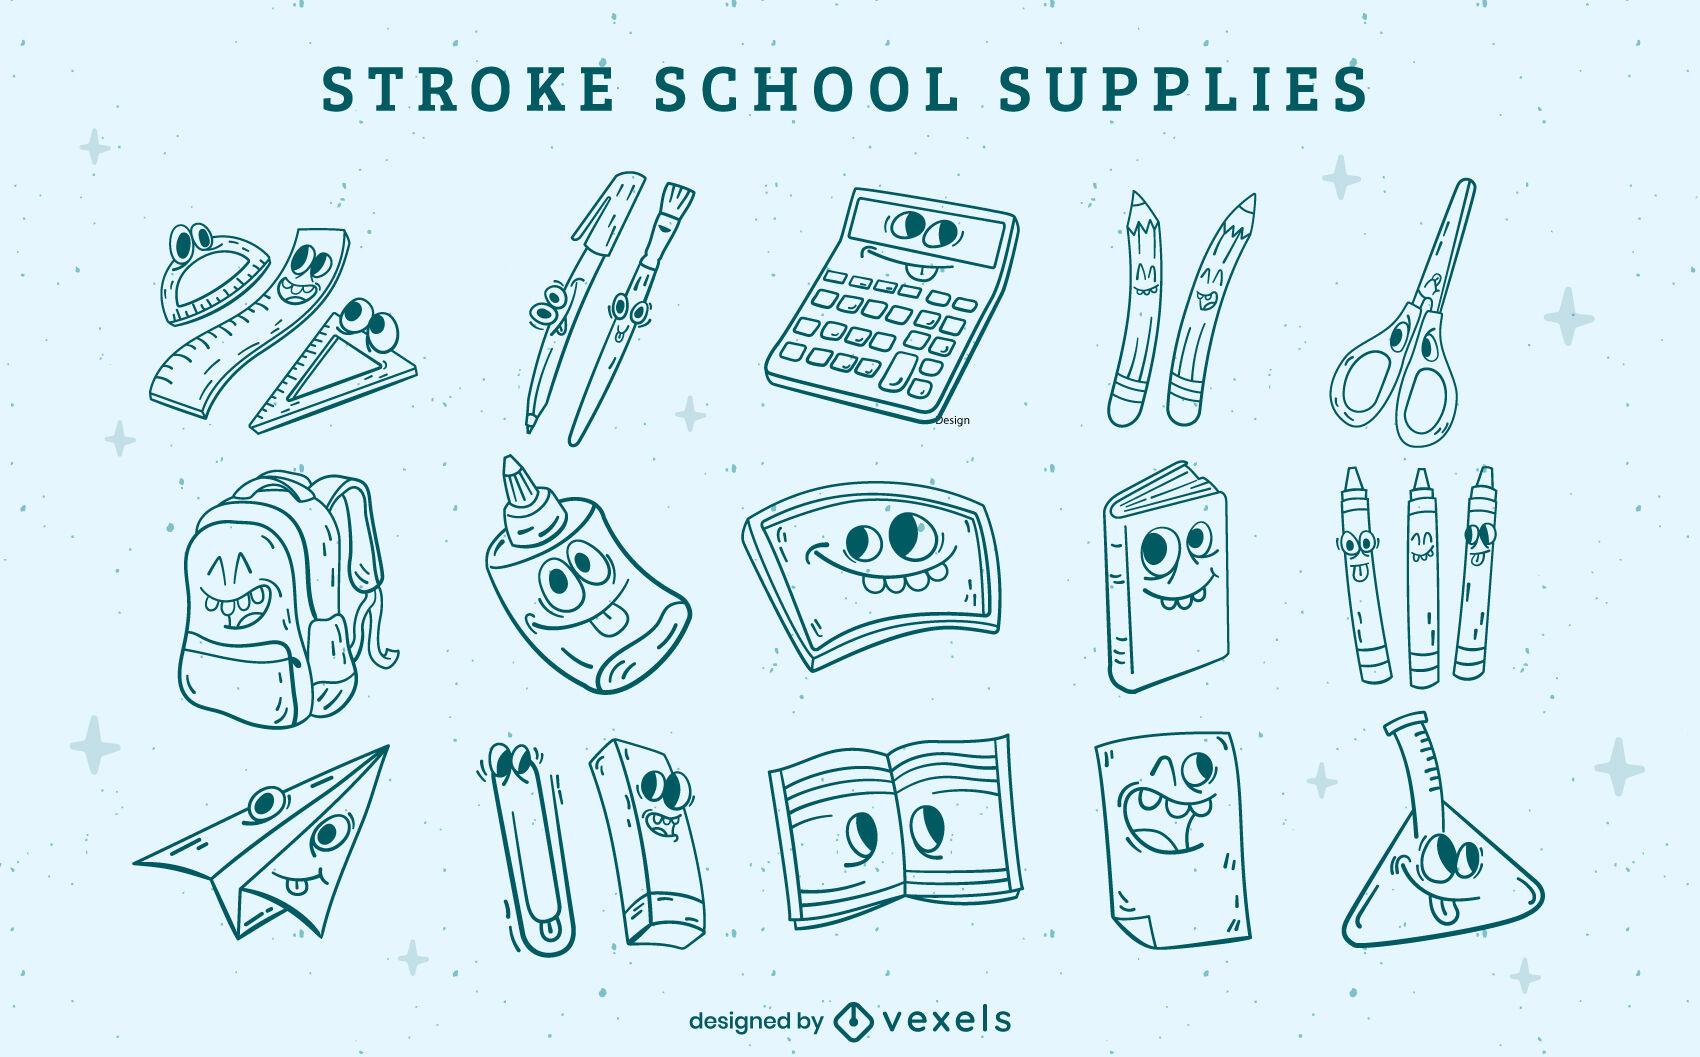 School supplies cartoon stroke elements